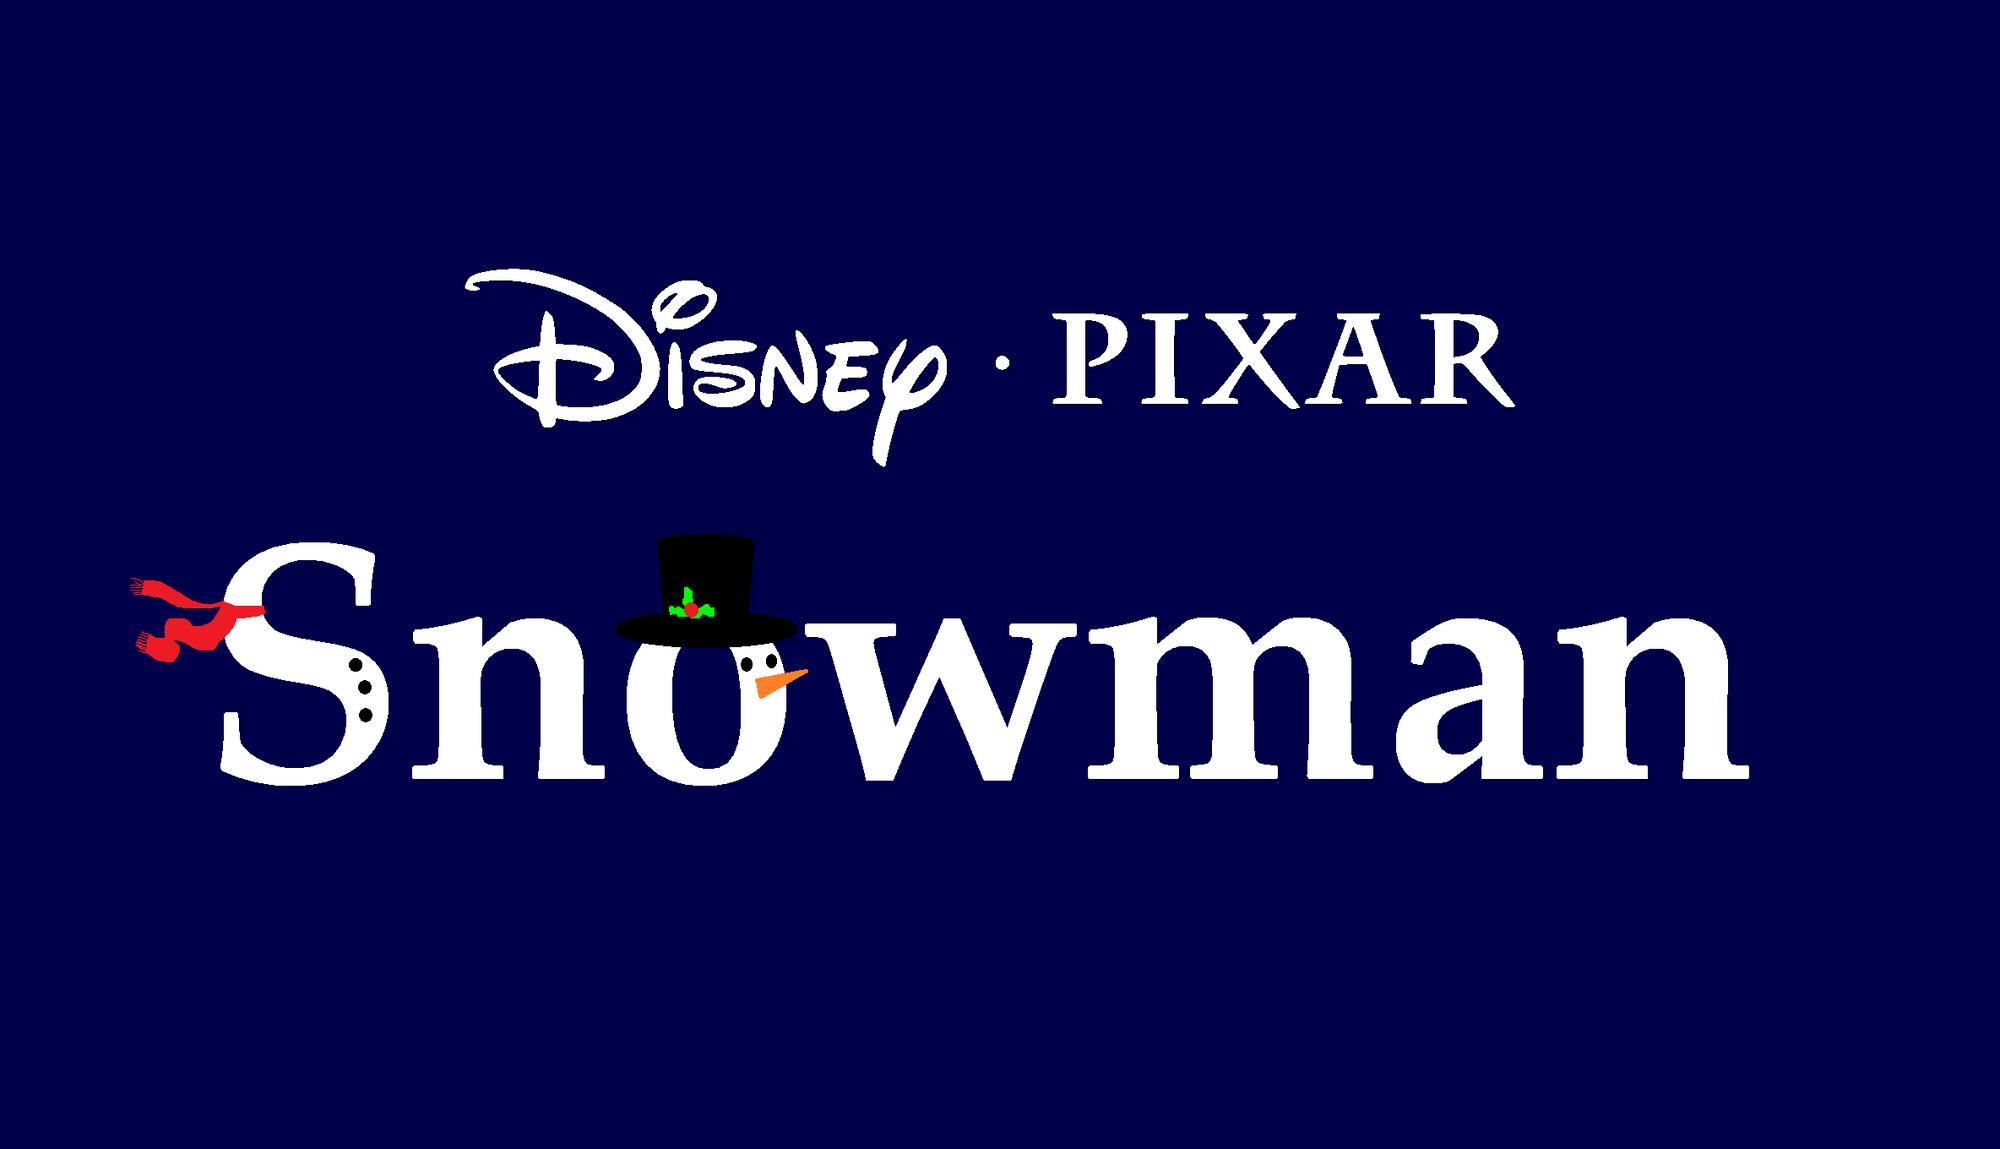 Snowman 2023 Disney Pixar Film Idea Wiki Fandom